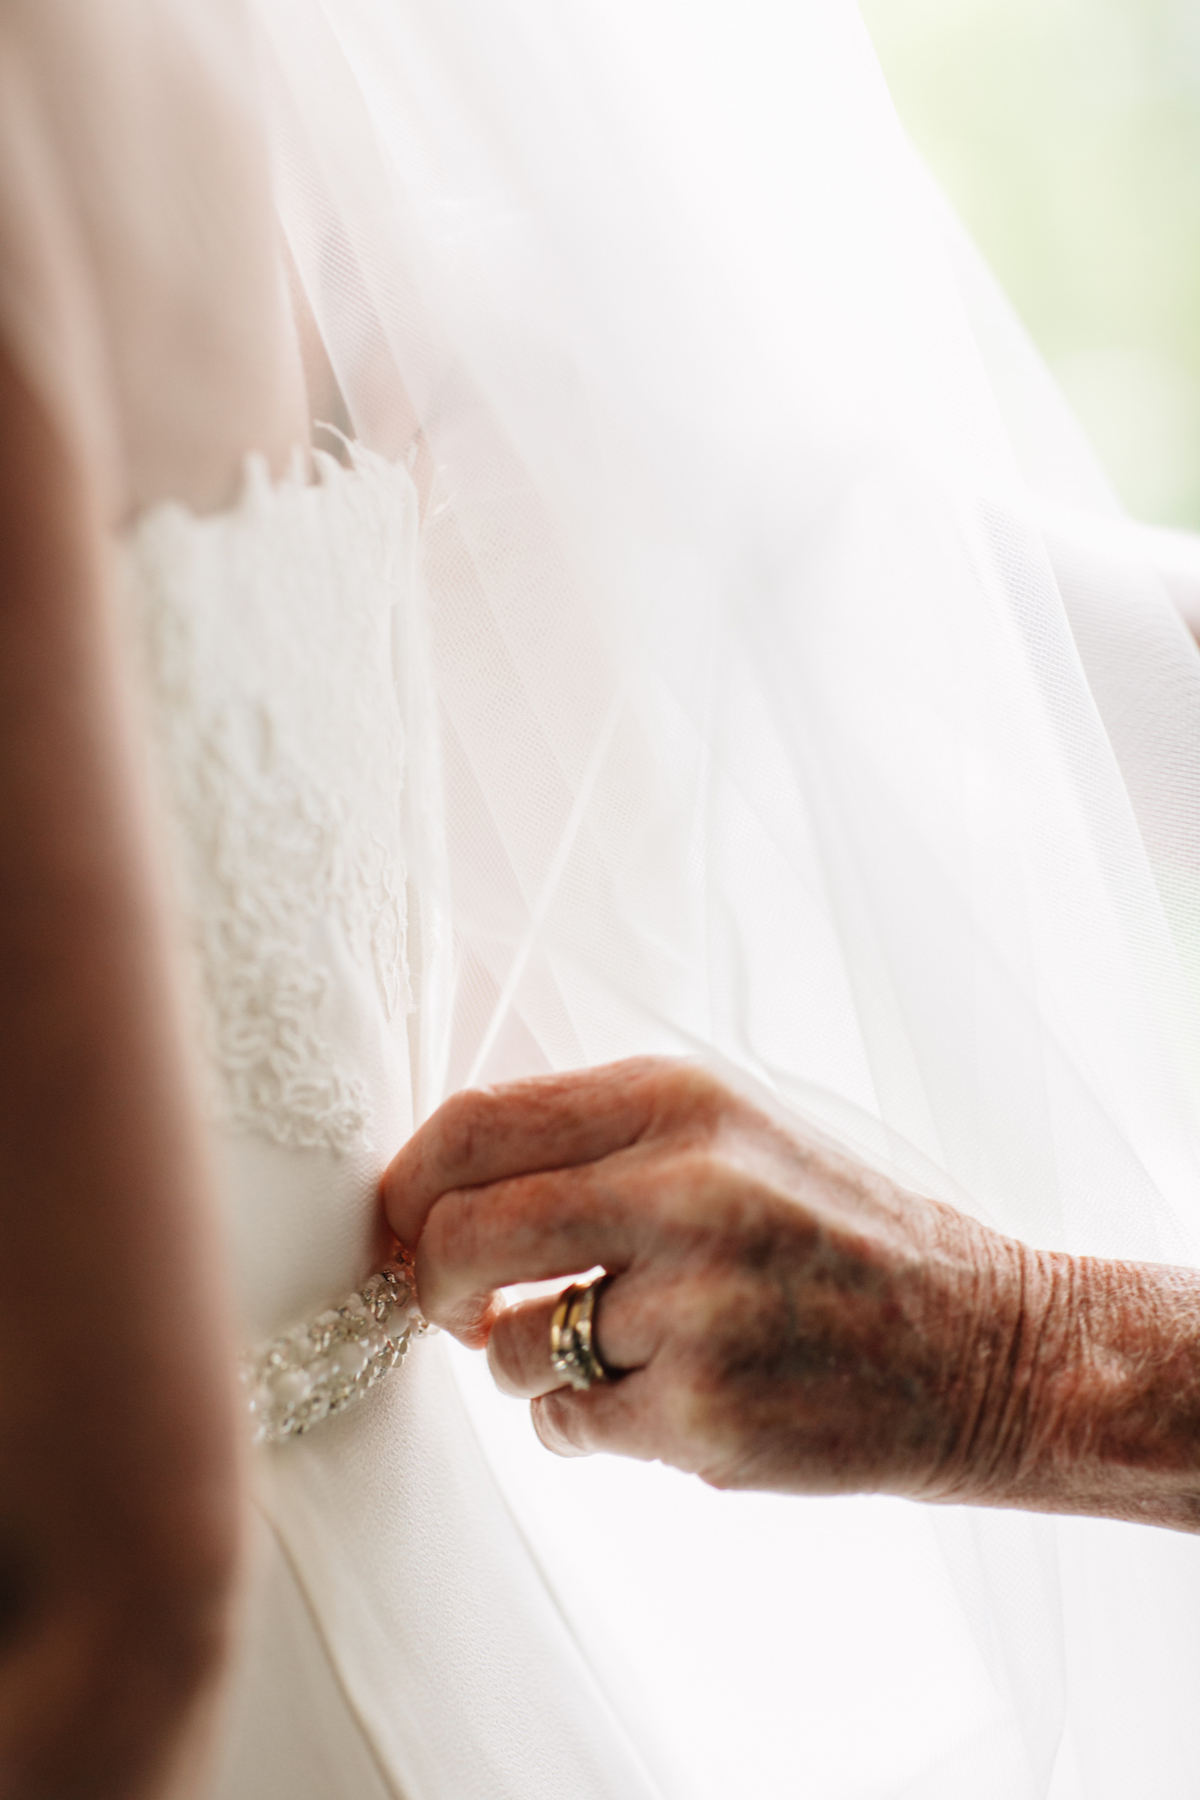 engle-olson-mark-fierst-minnesota-wedding-6.jpg